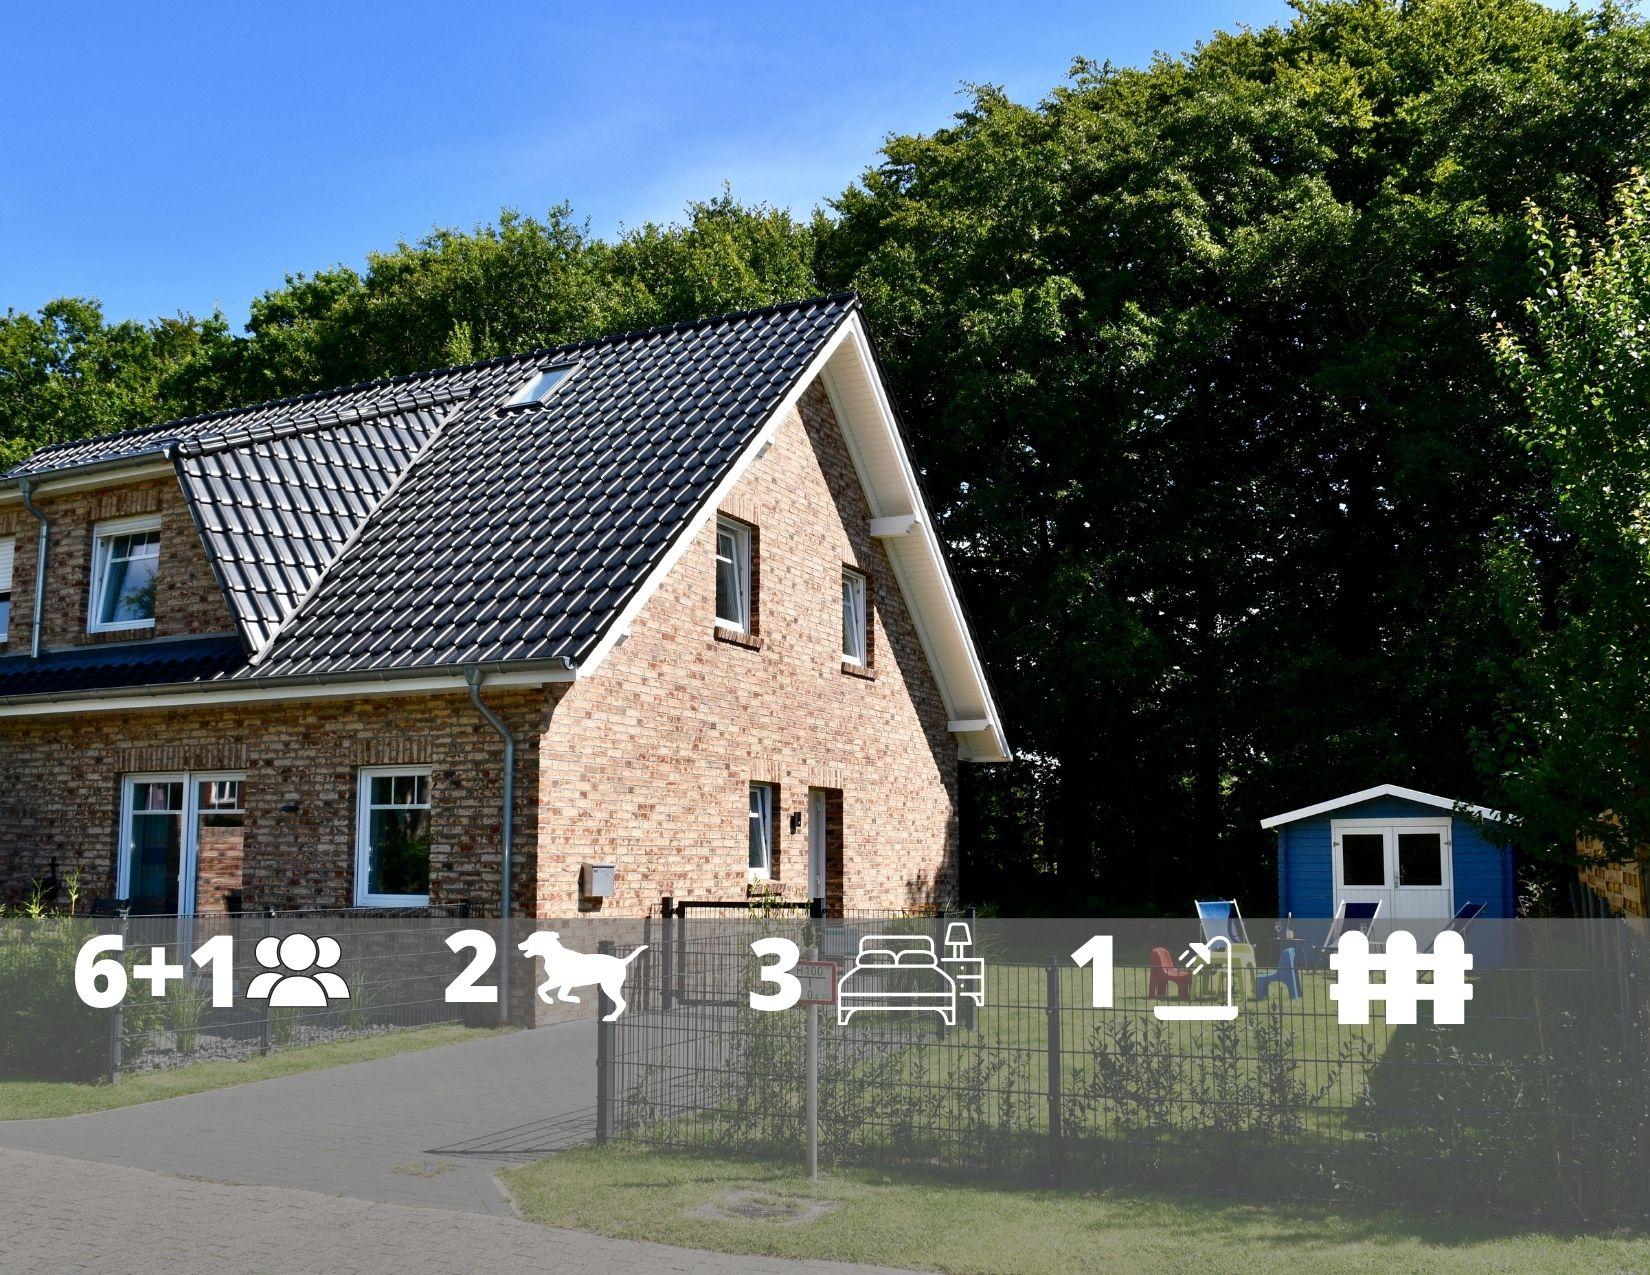 Nordsee Ferienhaus Huus lüttje Finja